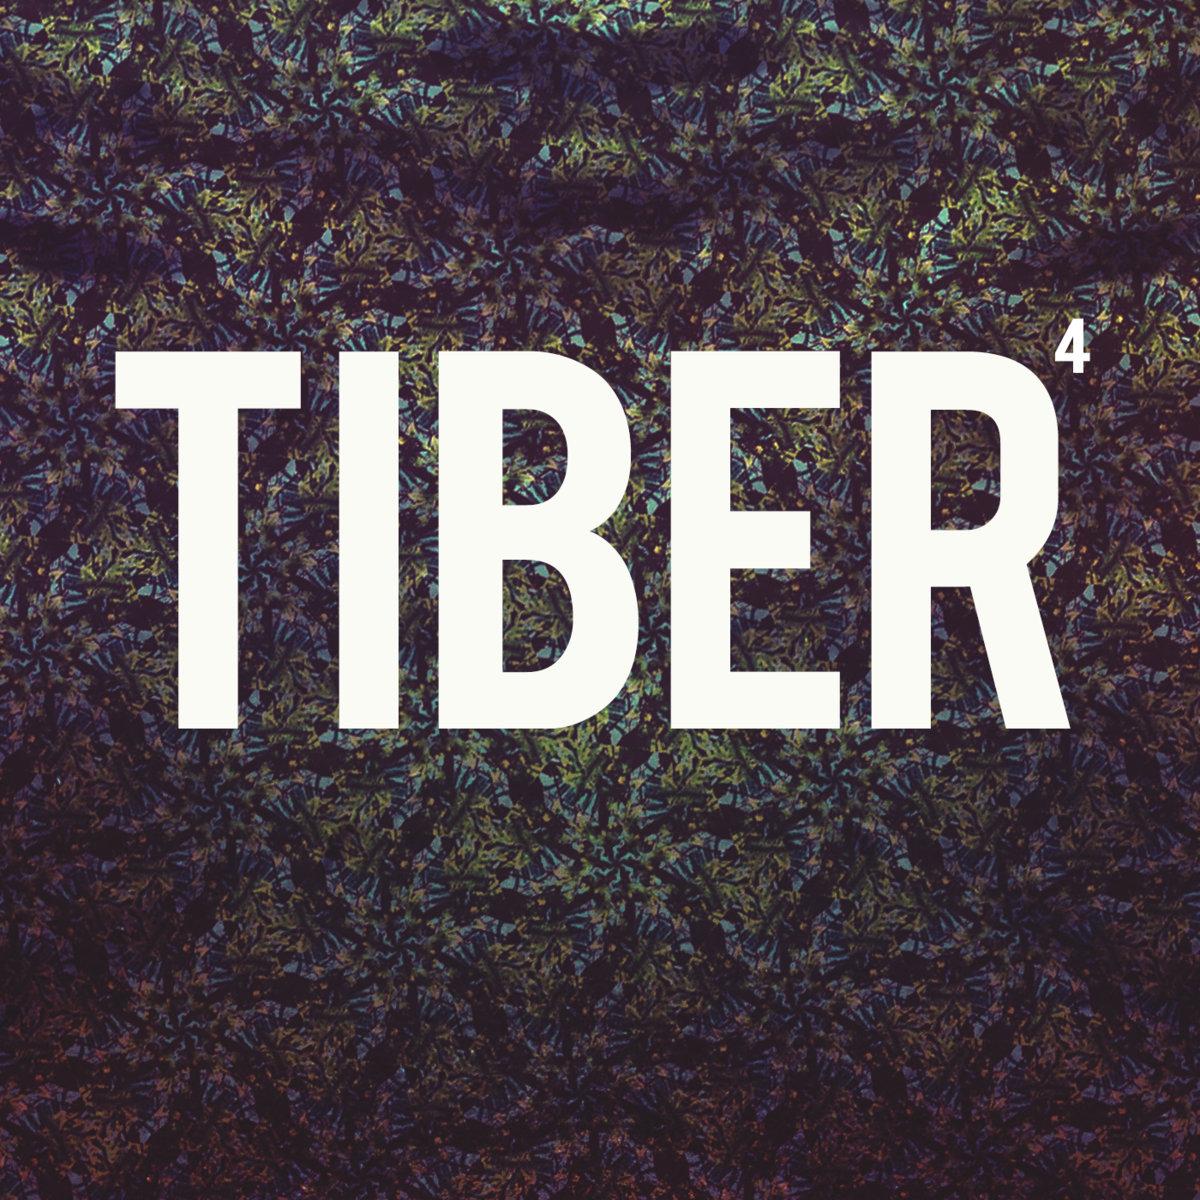 Tiber - Tiber 4 - Released May 2013